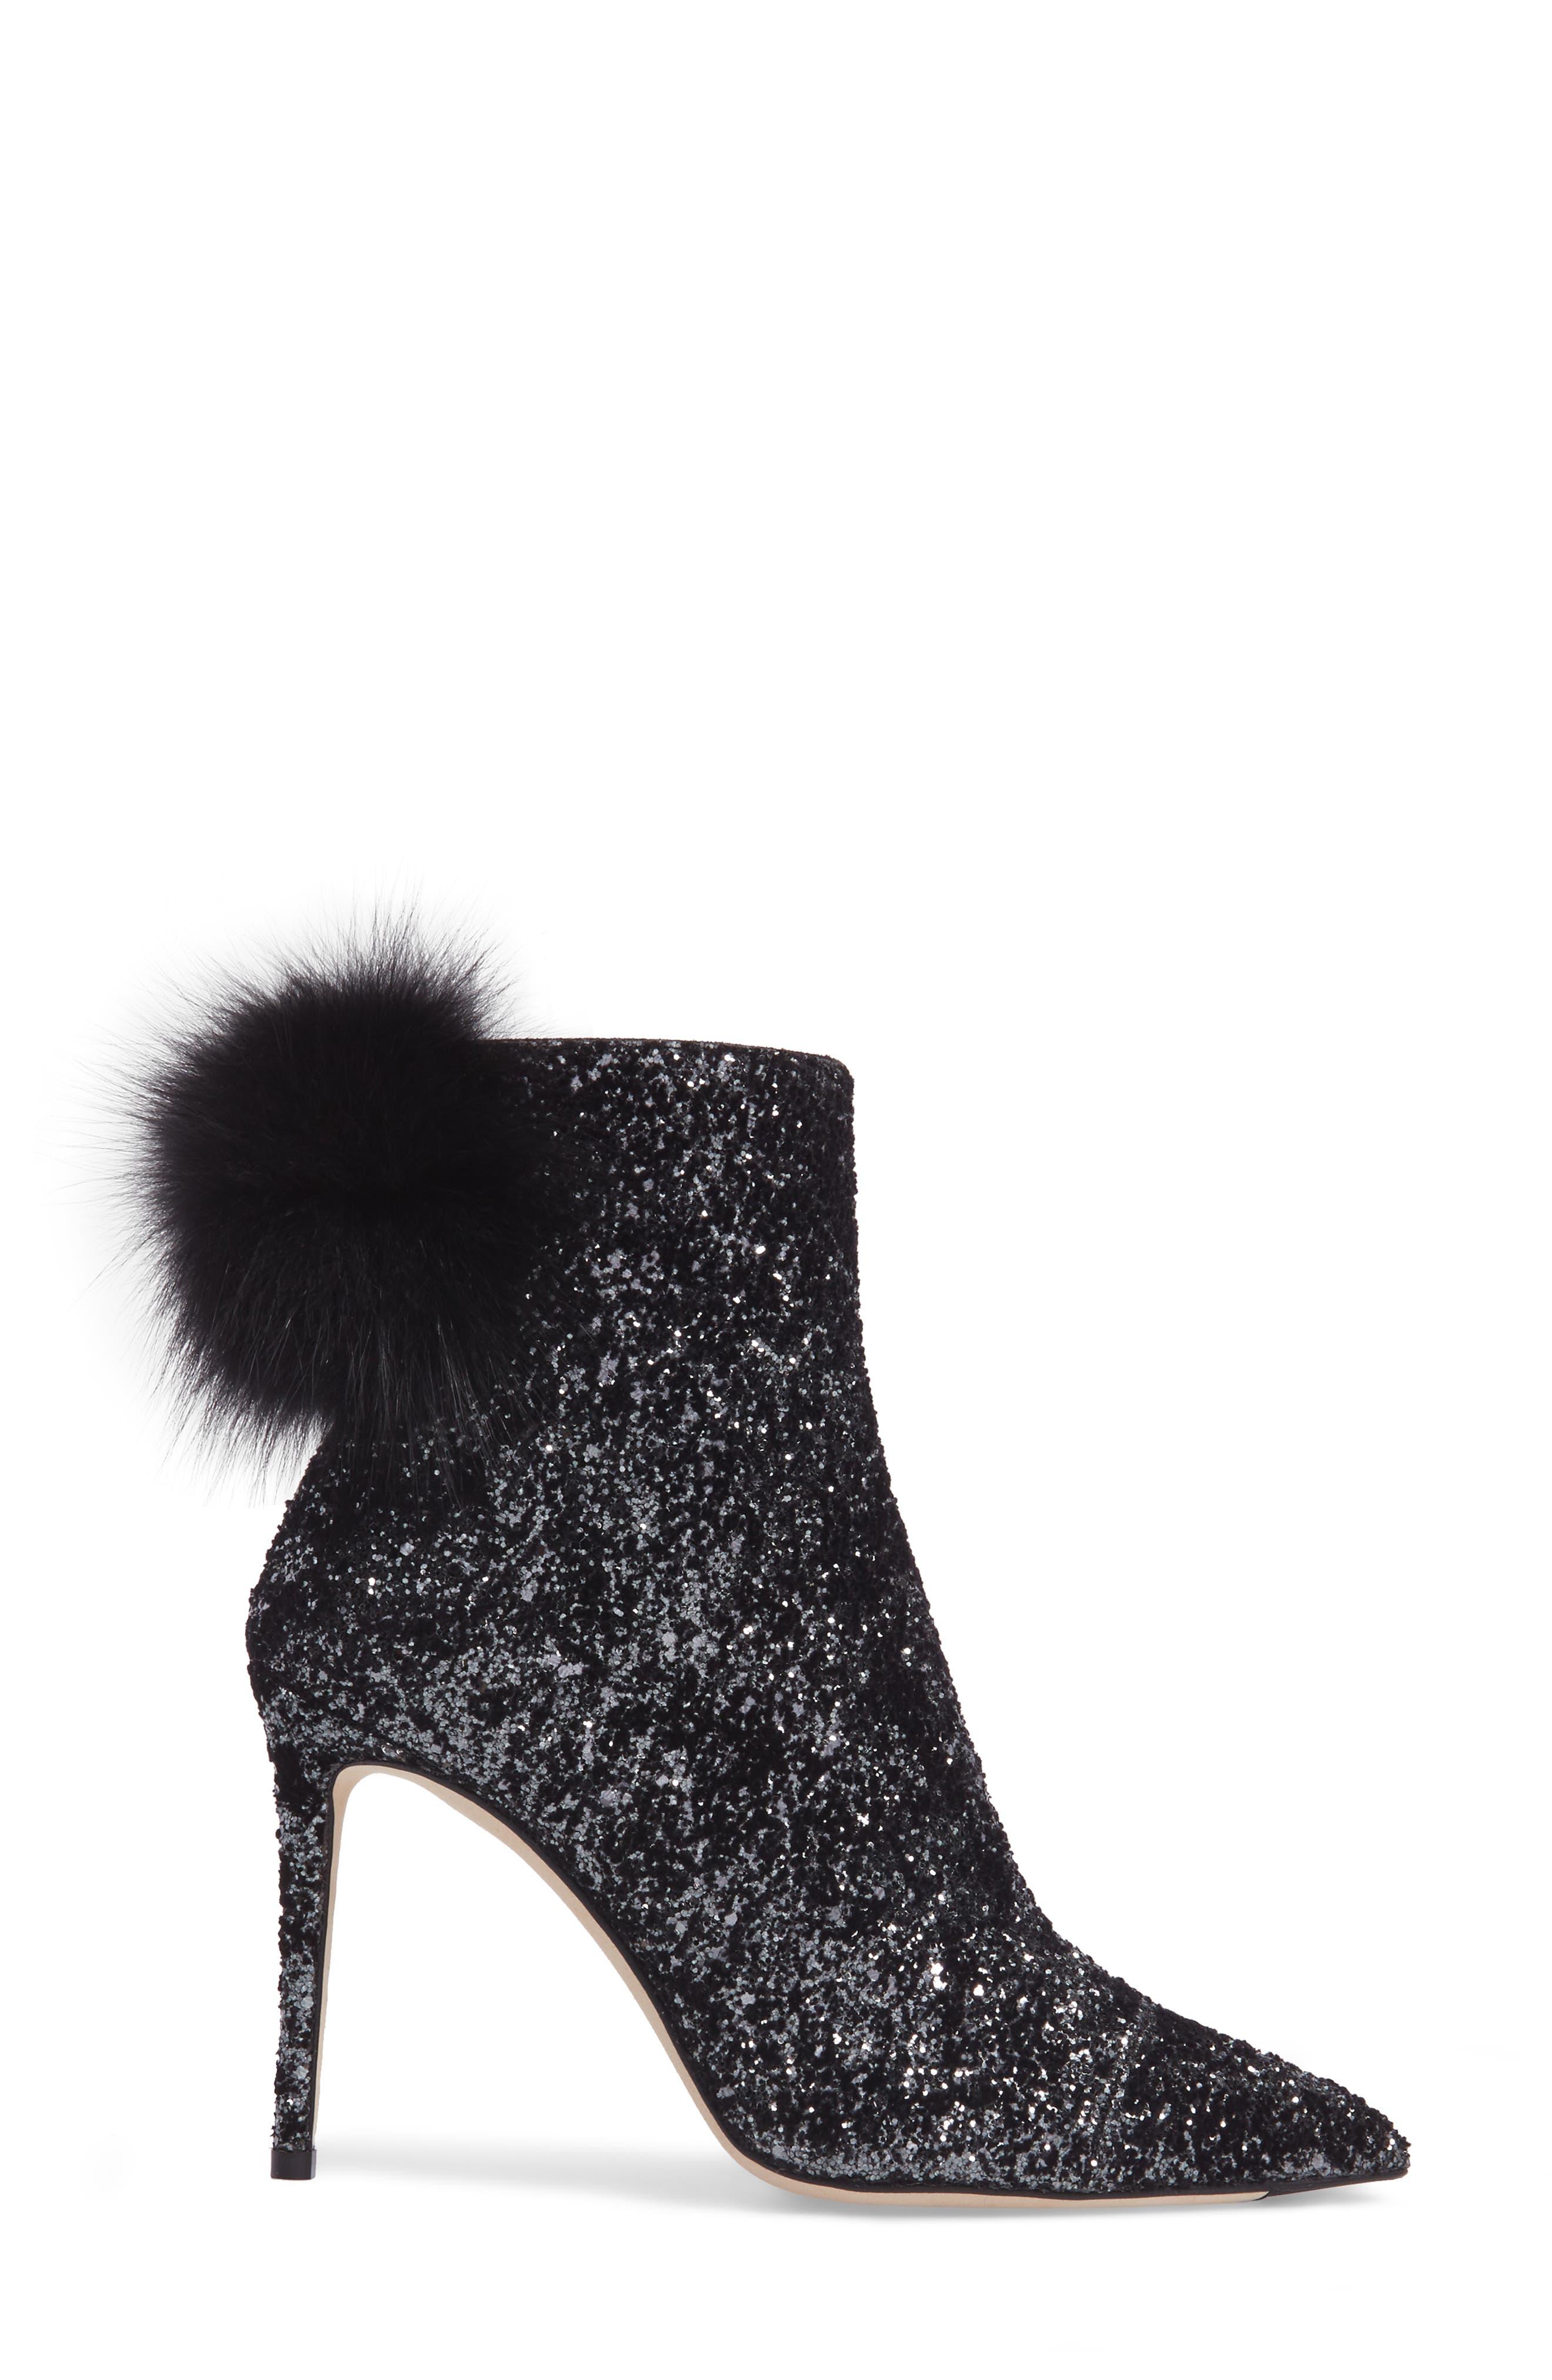 Tesler Genuine Fox Fur Bootie,                             Alternate thumbnail 3, color,                             Anthracite/ Black/ Black